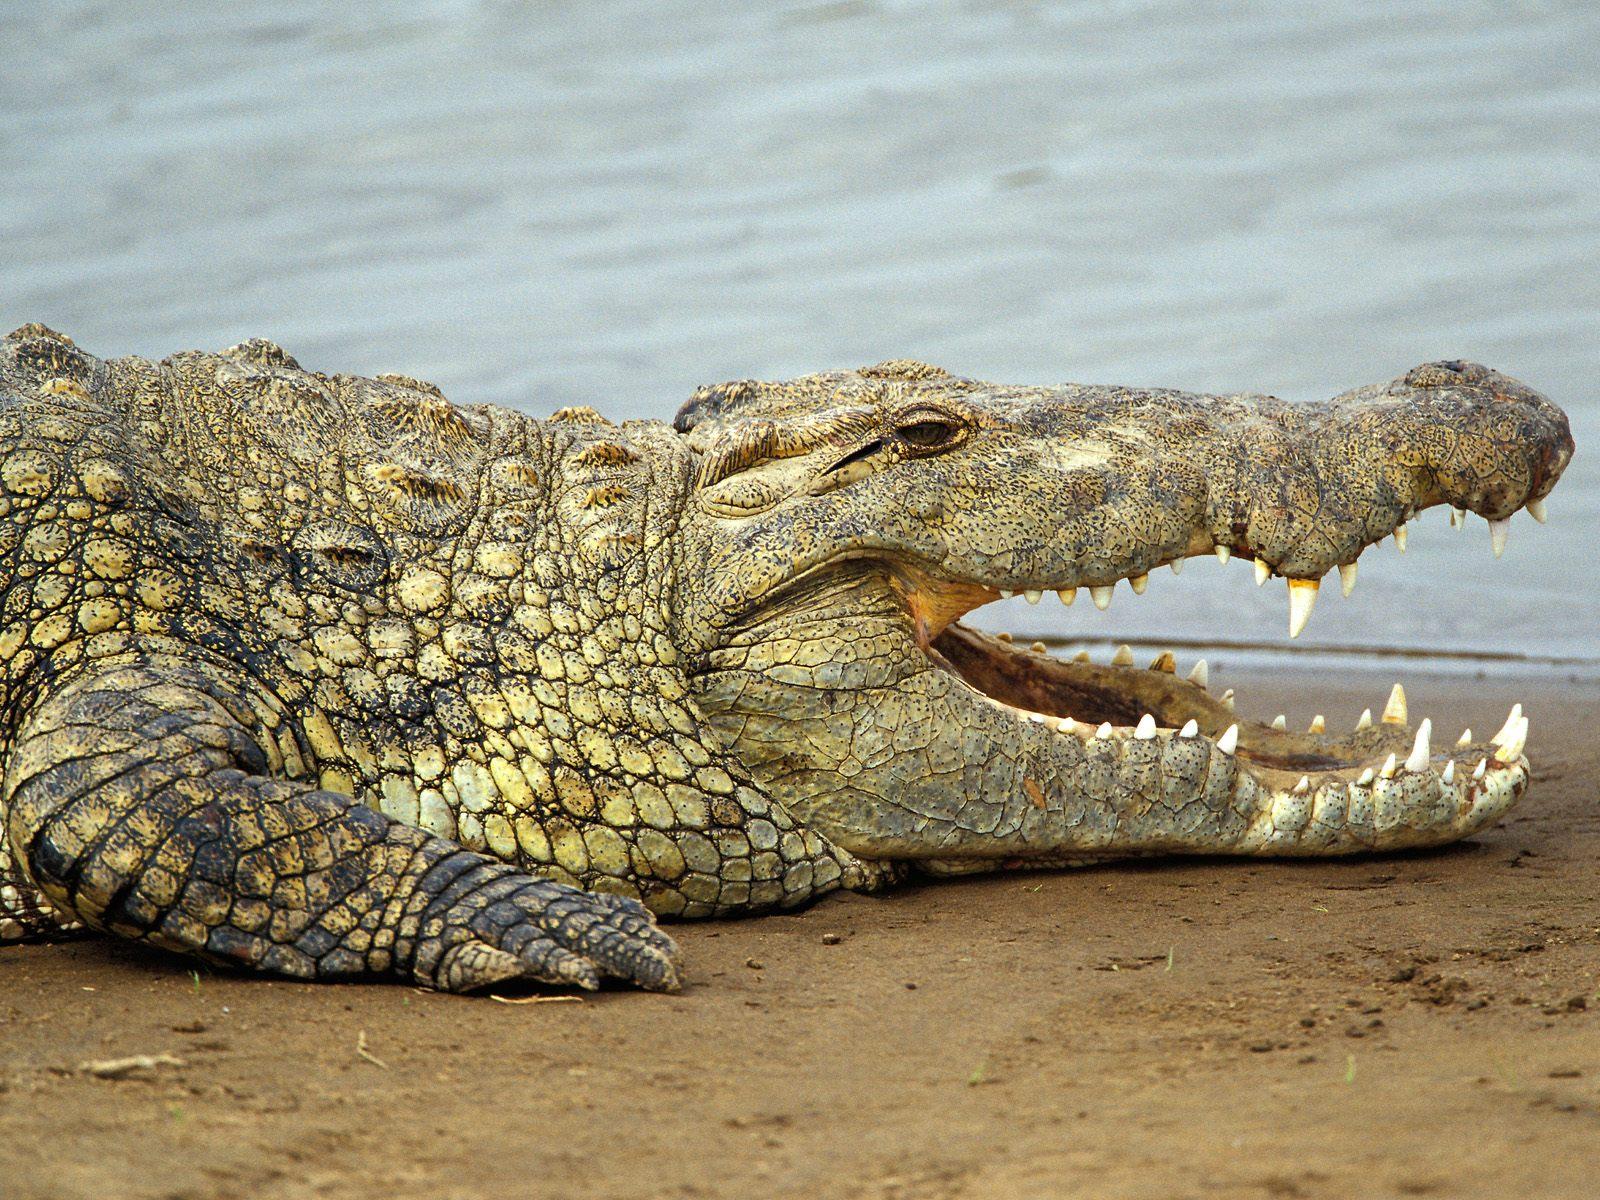 Nile crocodile eating zebra - photo#26